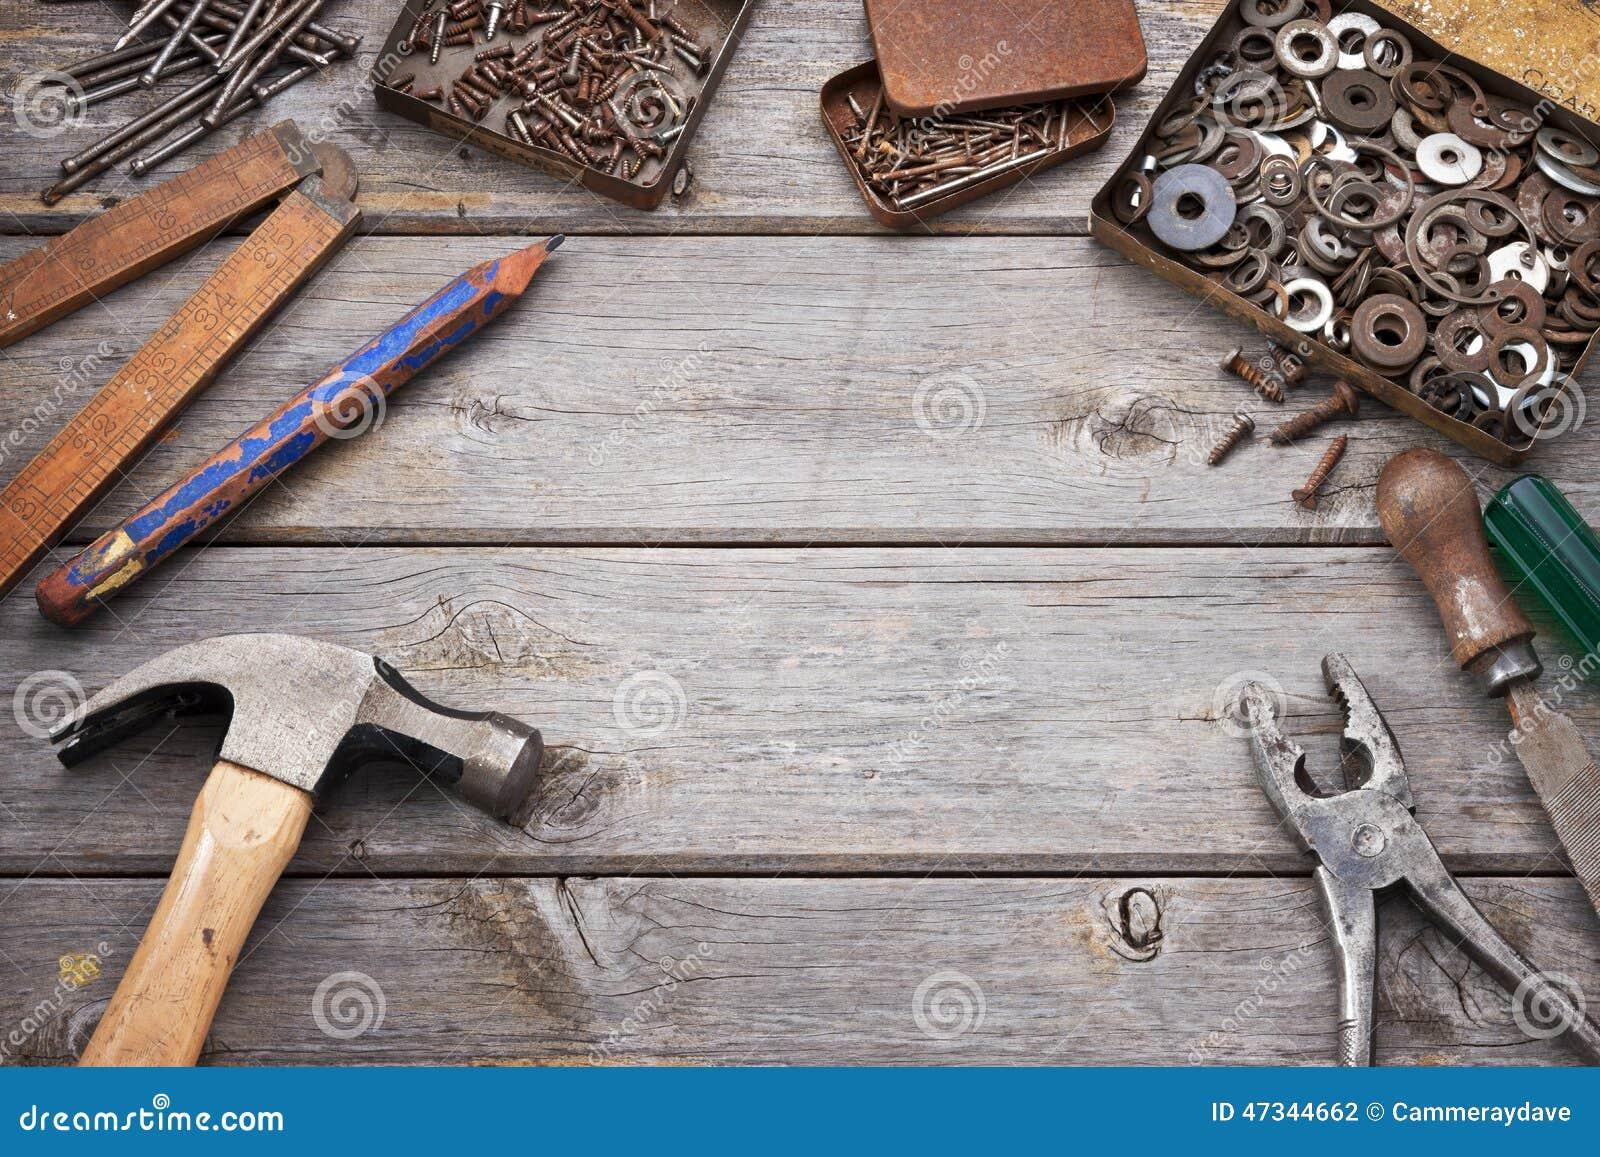 Tools Workbench Wood Background Stock Photo Image 47344662